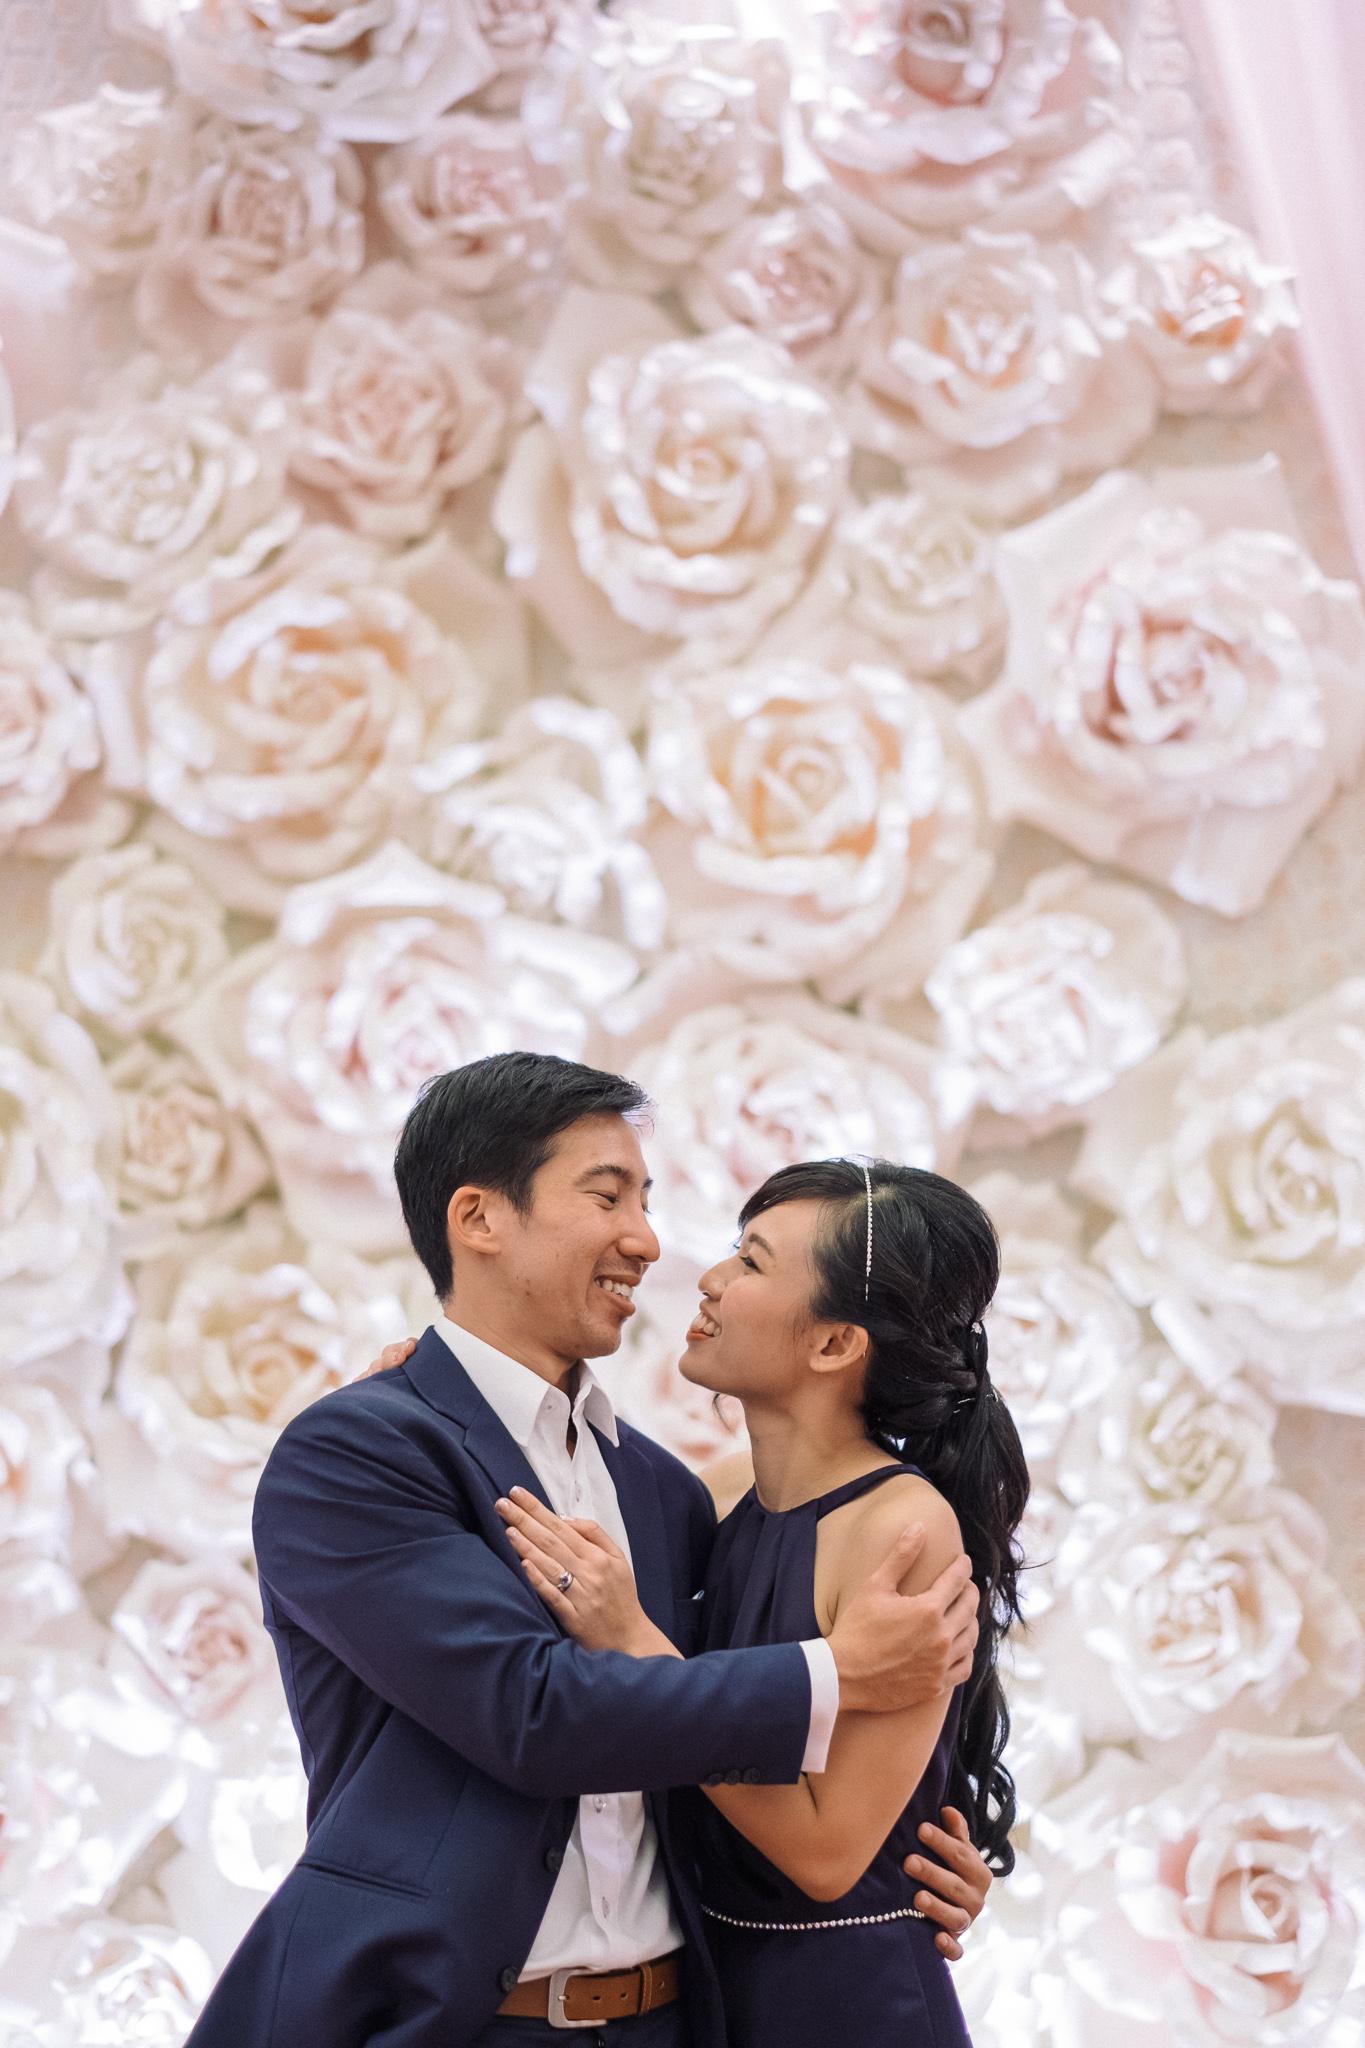 Juxtapose Pix - Wedding - Kelvin & Serene - church regent hotel 00046.jpg